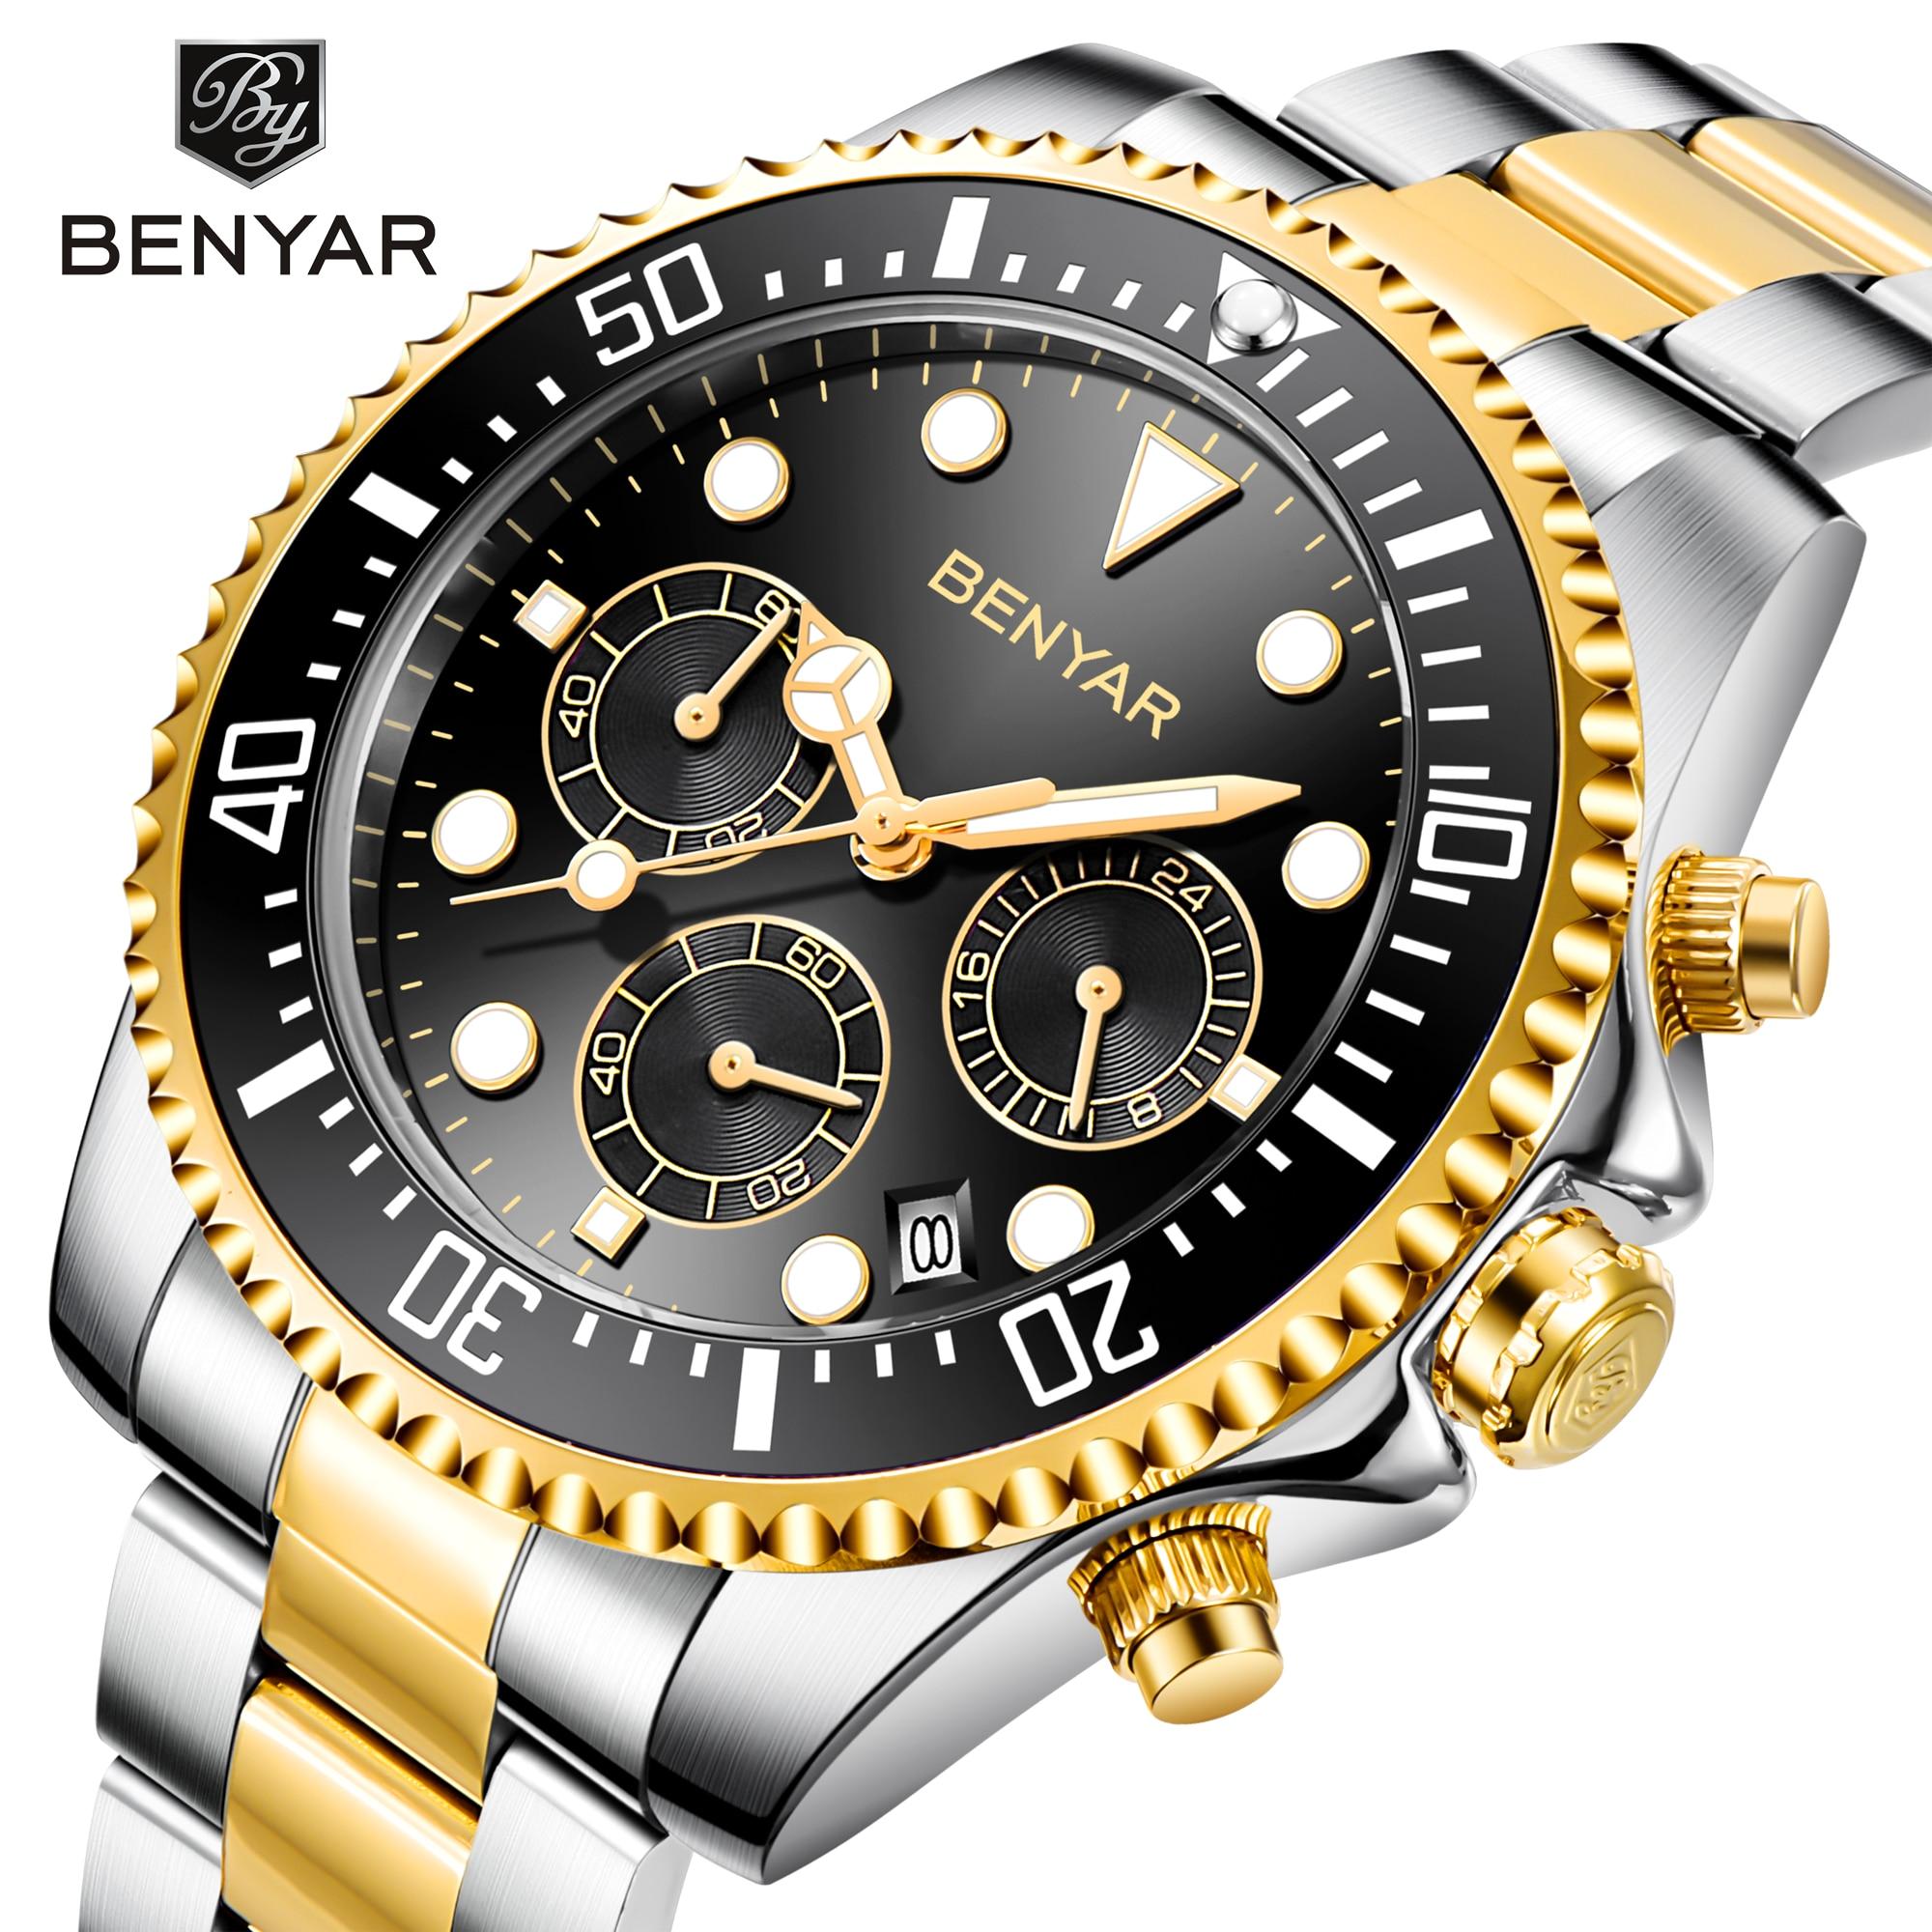 BENYAR-ساعة كوارتز فاخرة من الفولاذ المقاوم للصدأ للرجال ، كرونوغراف رياضي ، ماركة فاخرة ، 2020